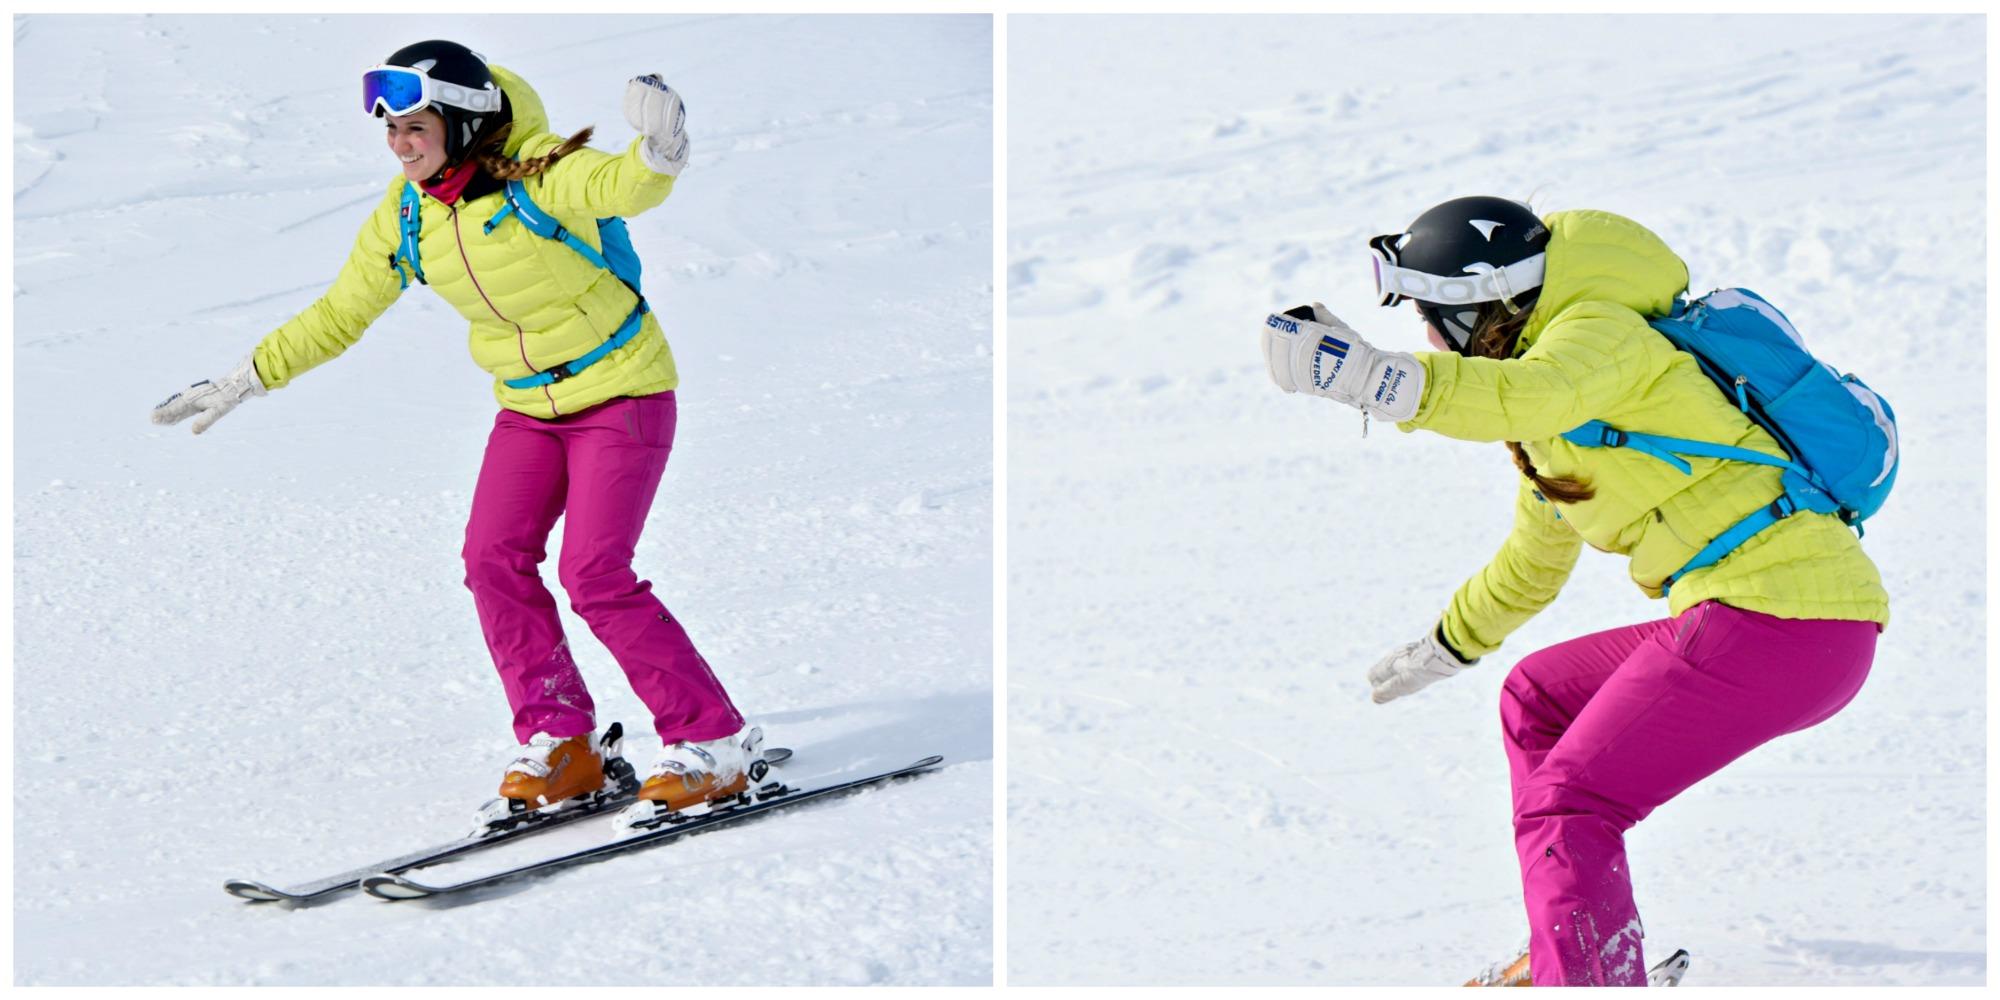 Fitnessblog-kästle-ski-klara-fuchs-österreich-blogger-sport-winter25-collage